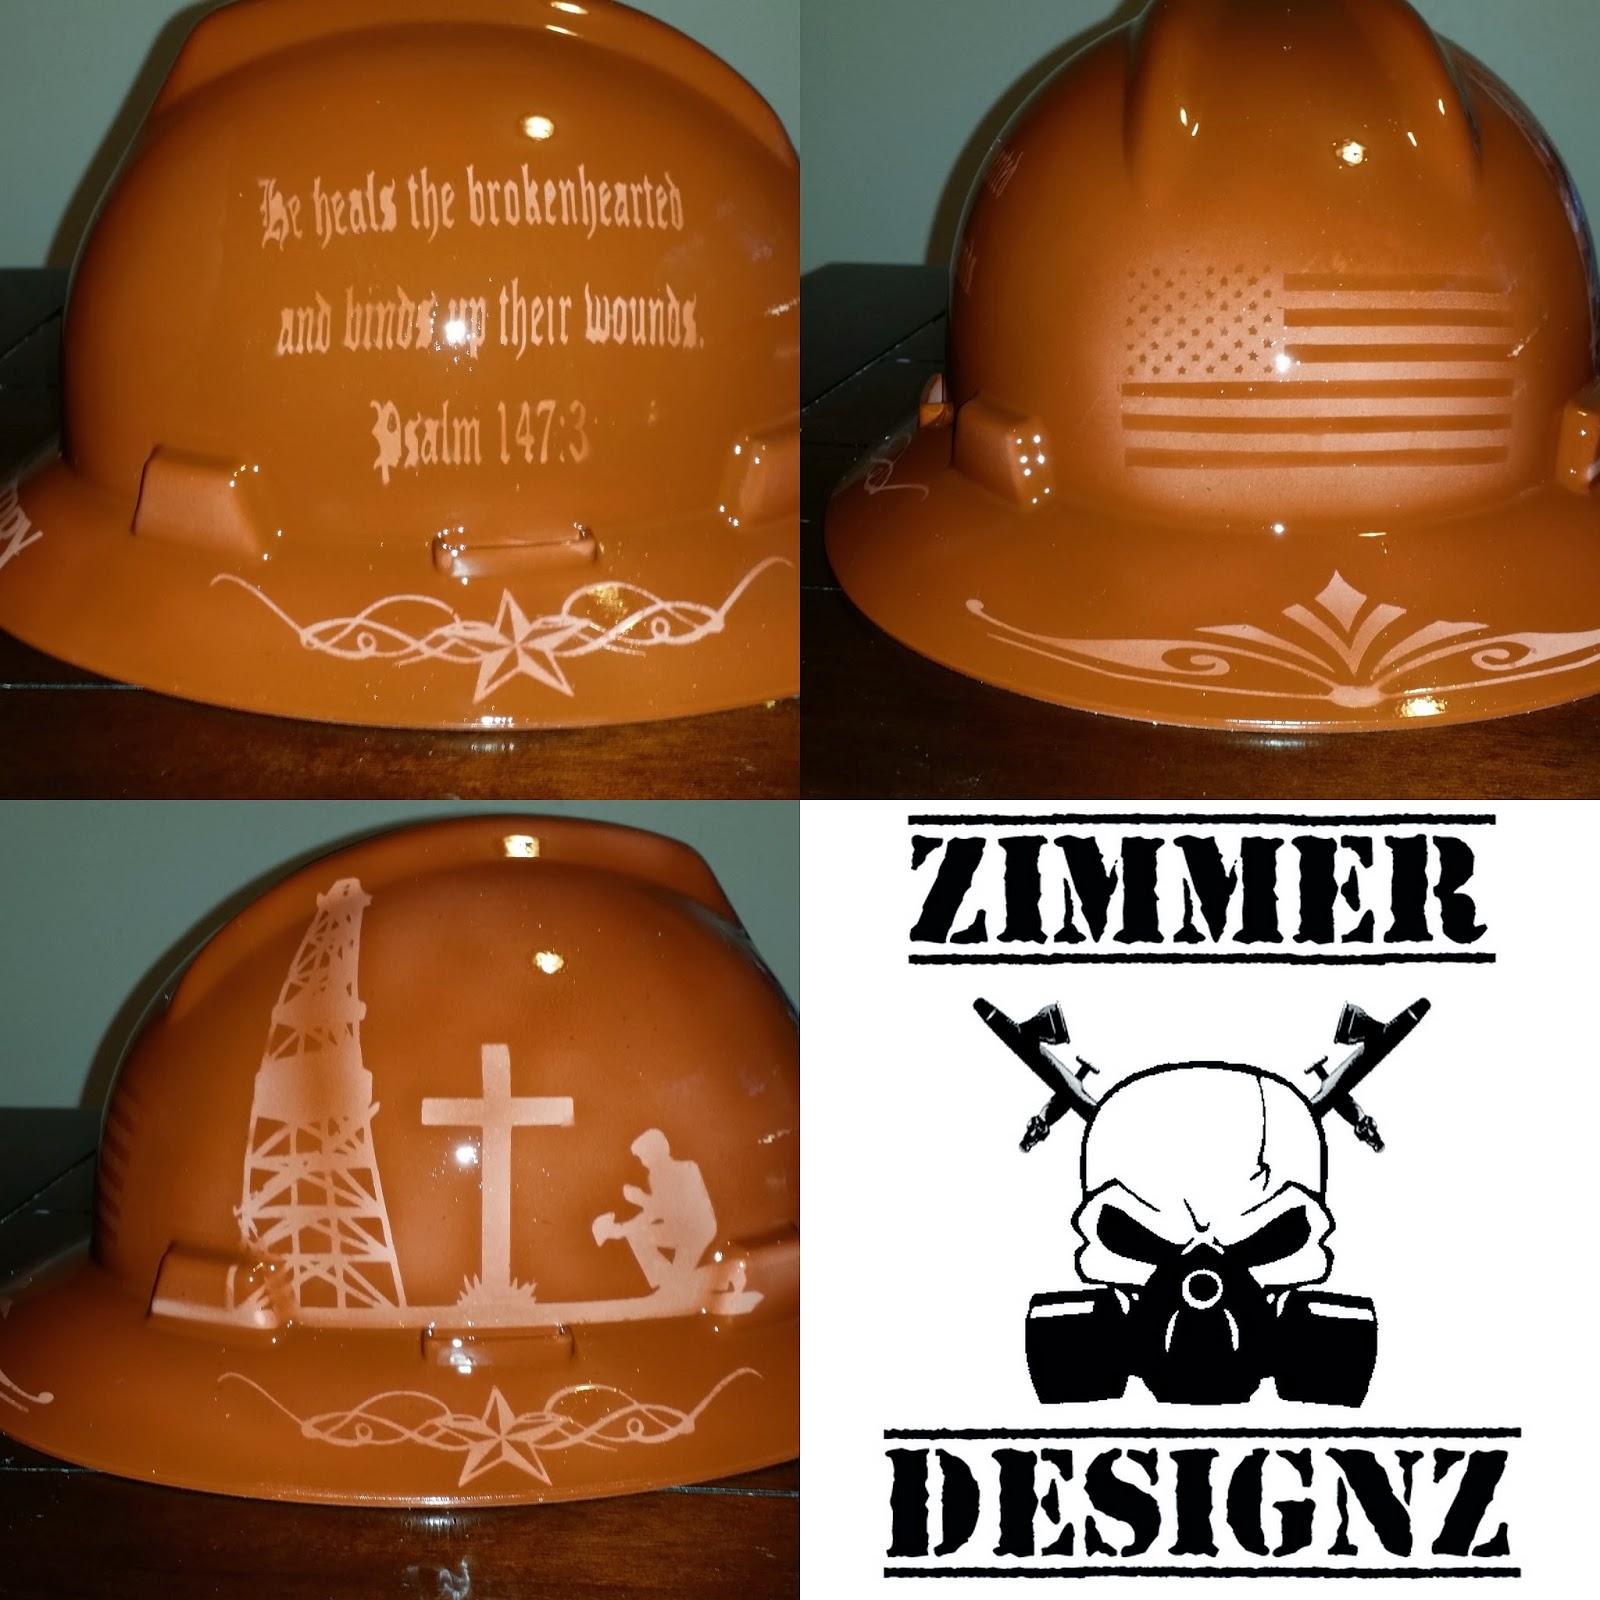 Real Carbon Fiber Hard Hat: Zimmer DesignZ Airbrush Shop